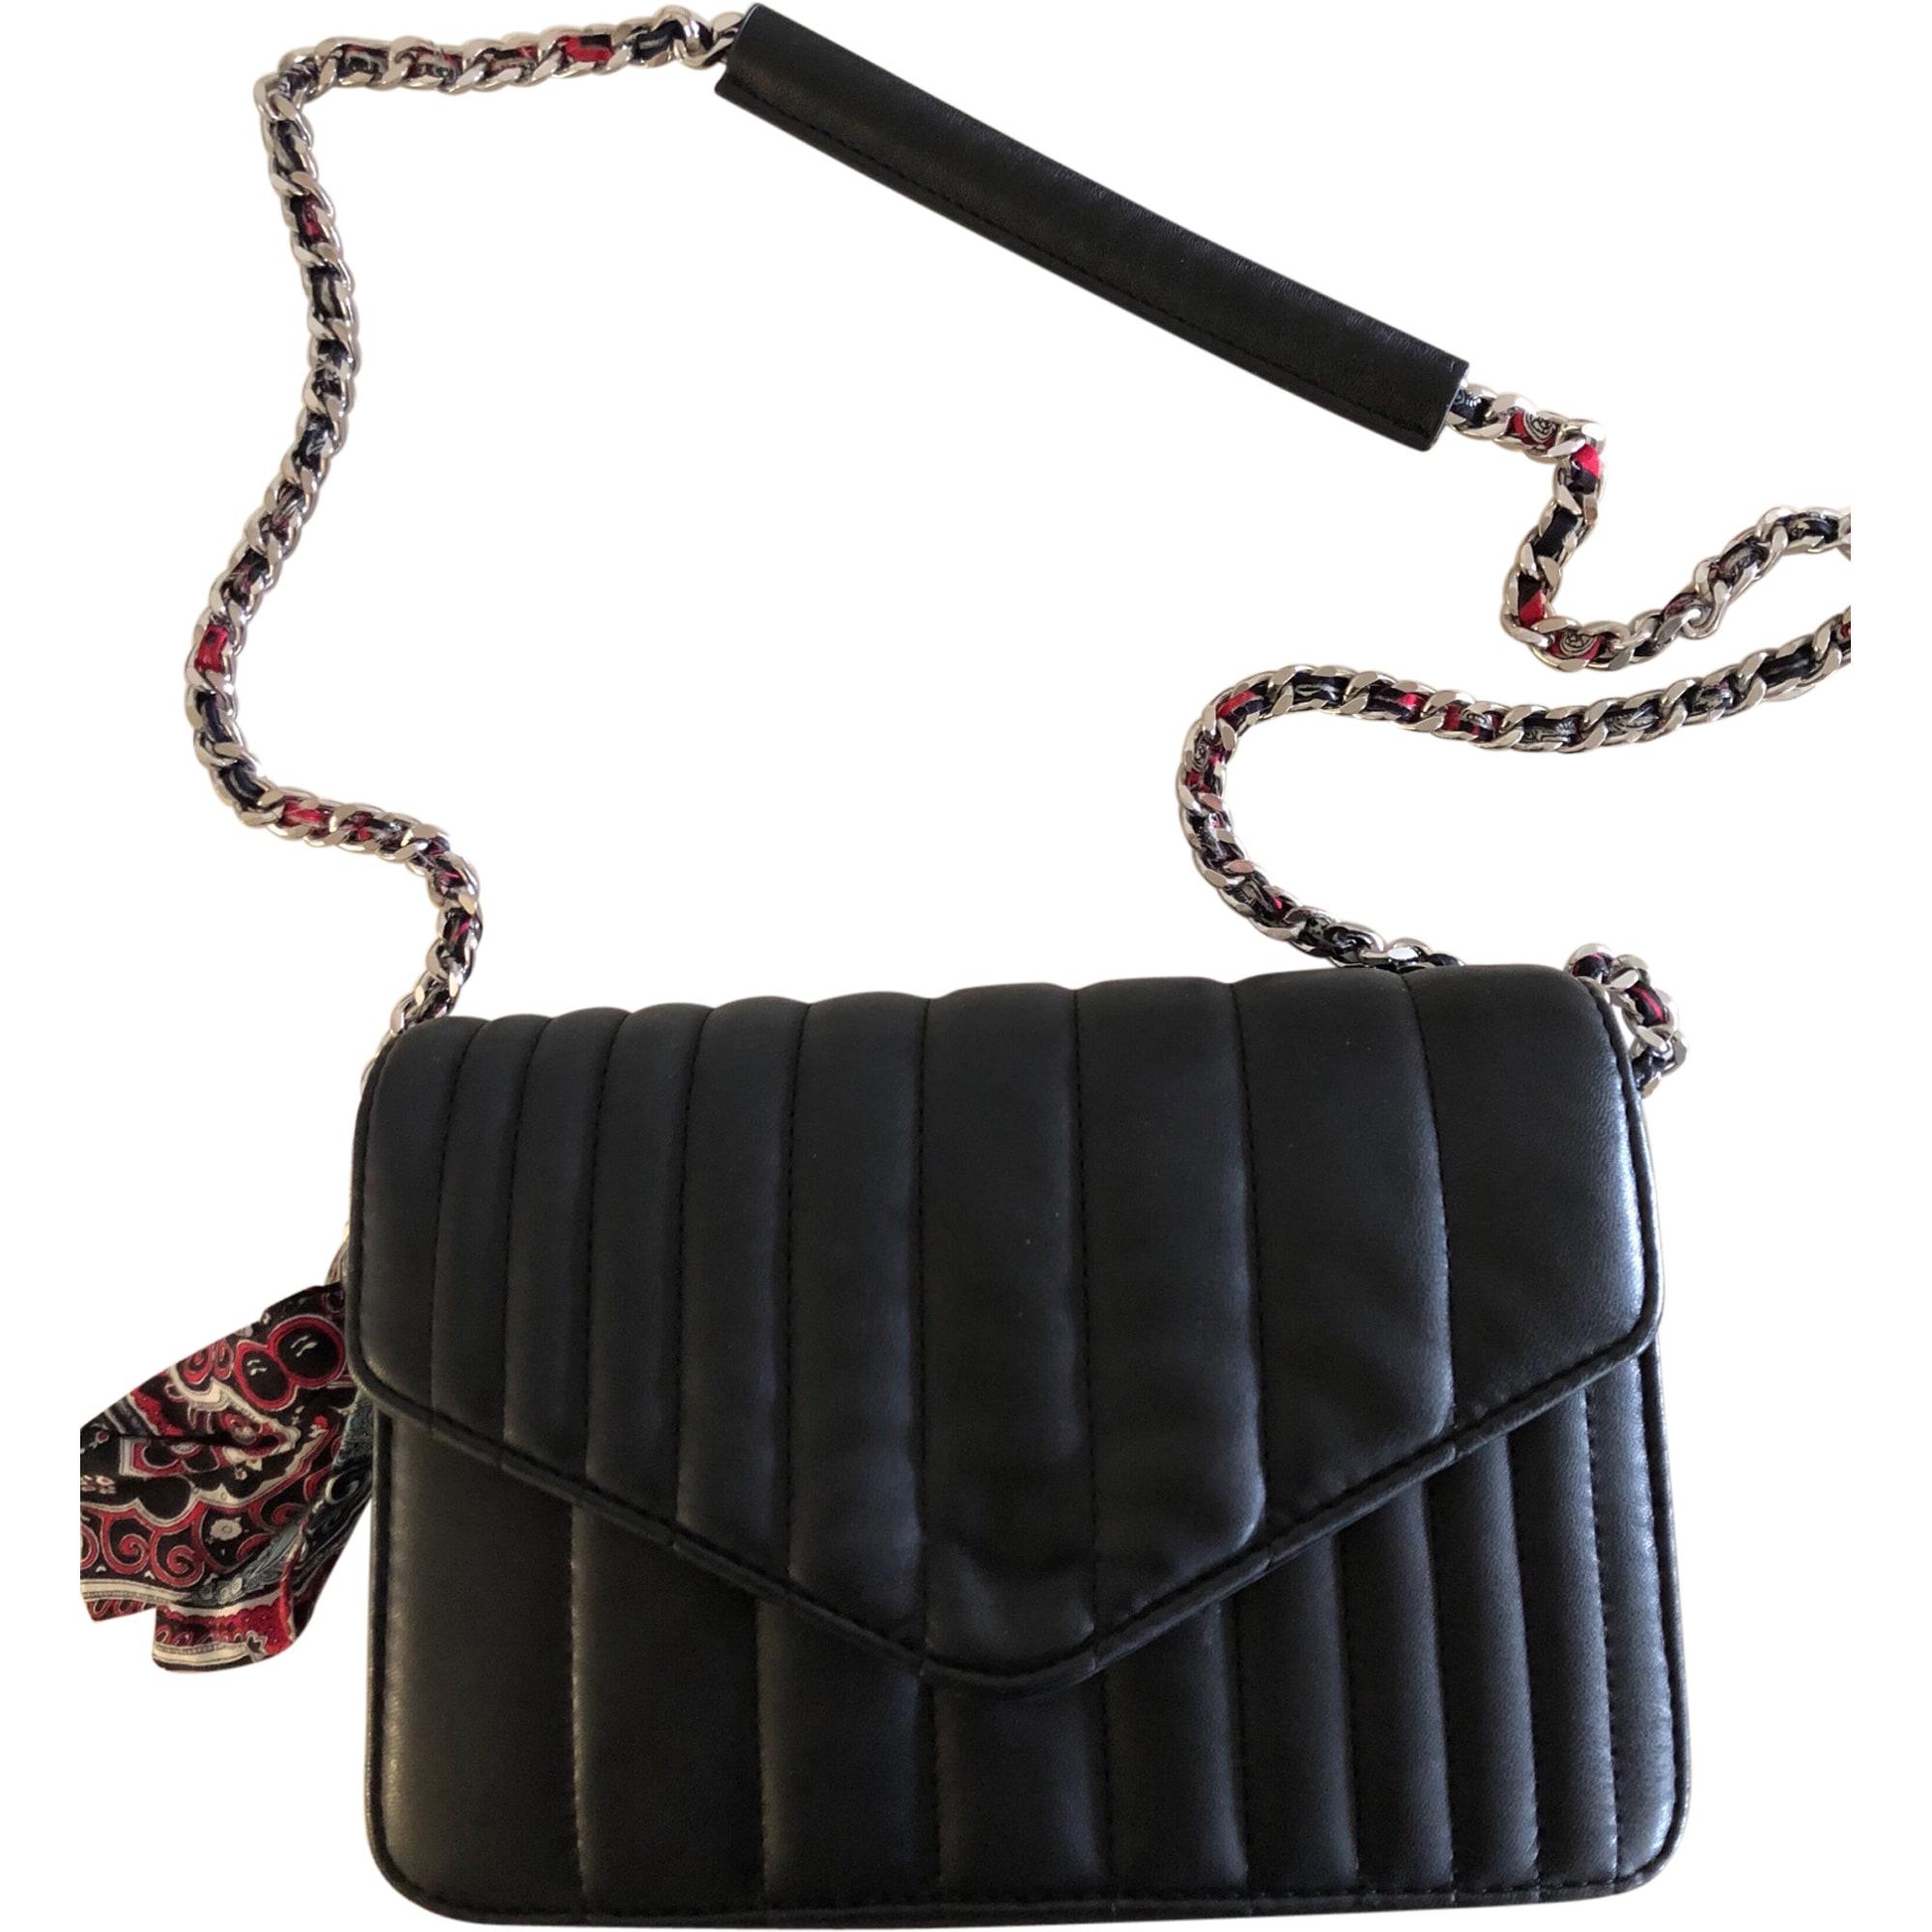 Sac En Zara 7705456 Noir Bandoulière Cuir CBoreWdx